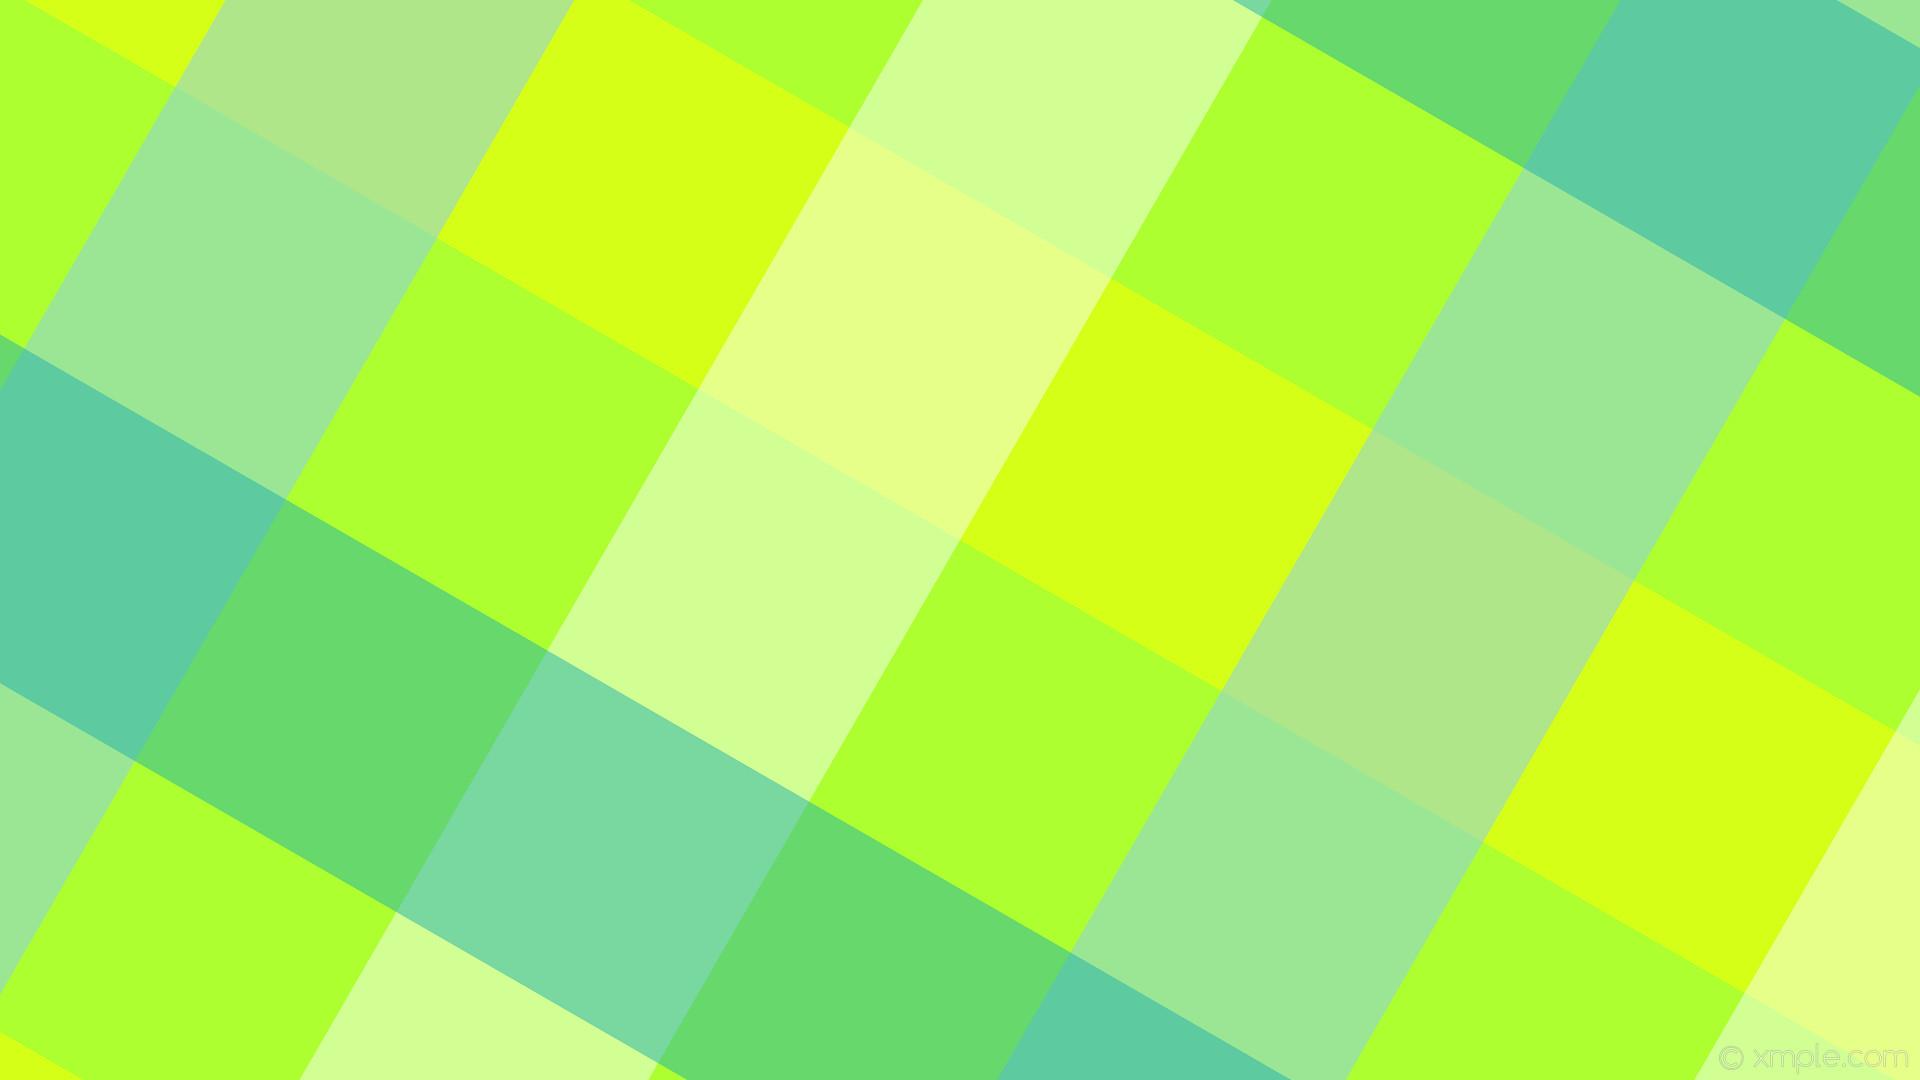 wallpaper yellow penta white blue green striped gingham green yellow mint  cream light sky blue light